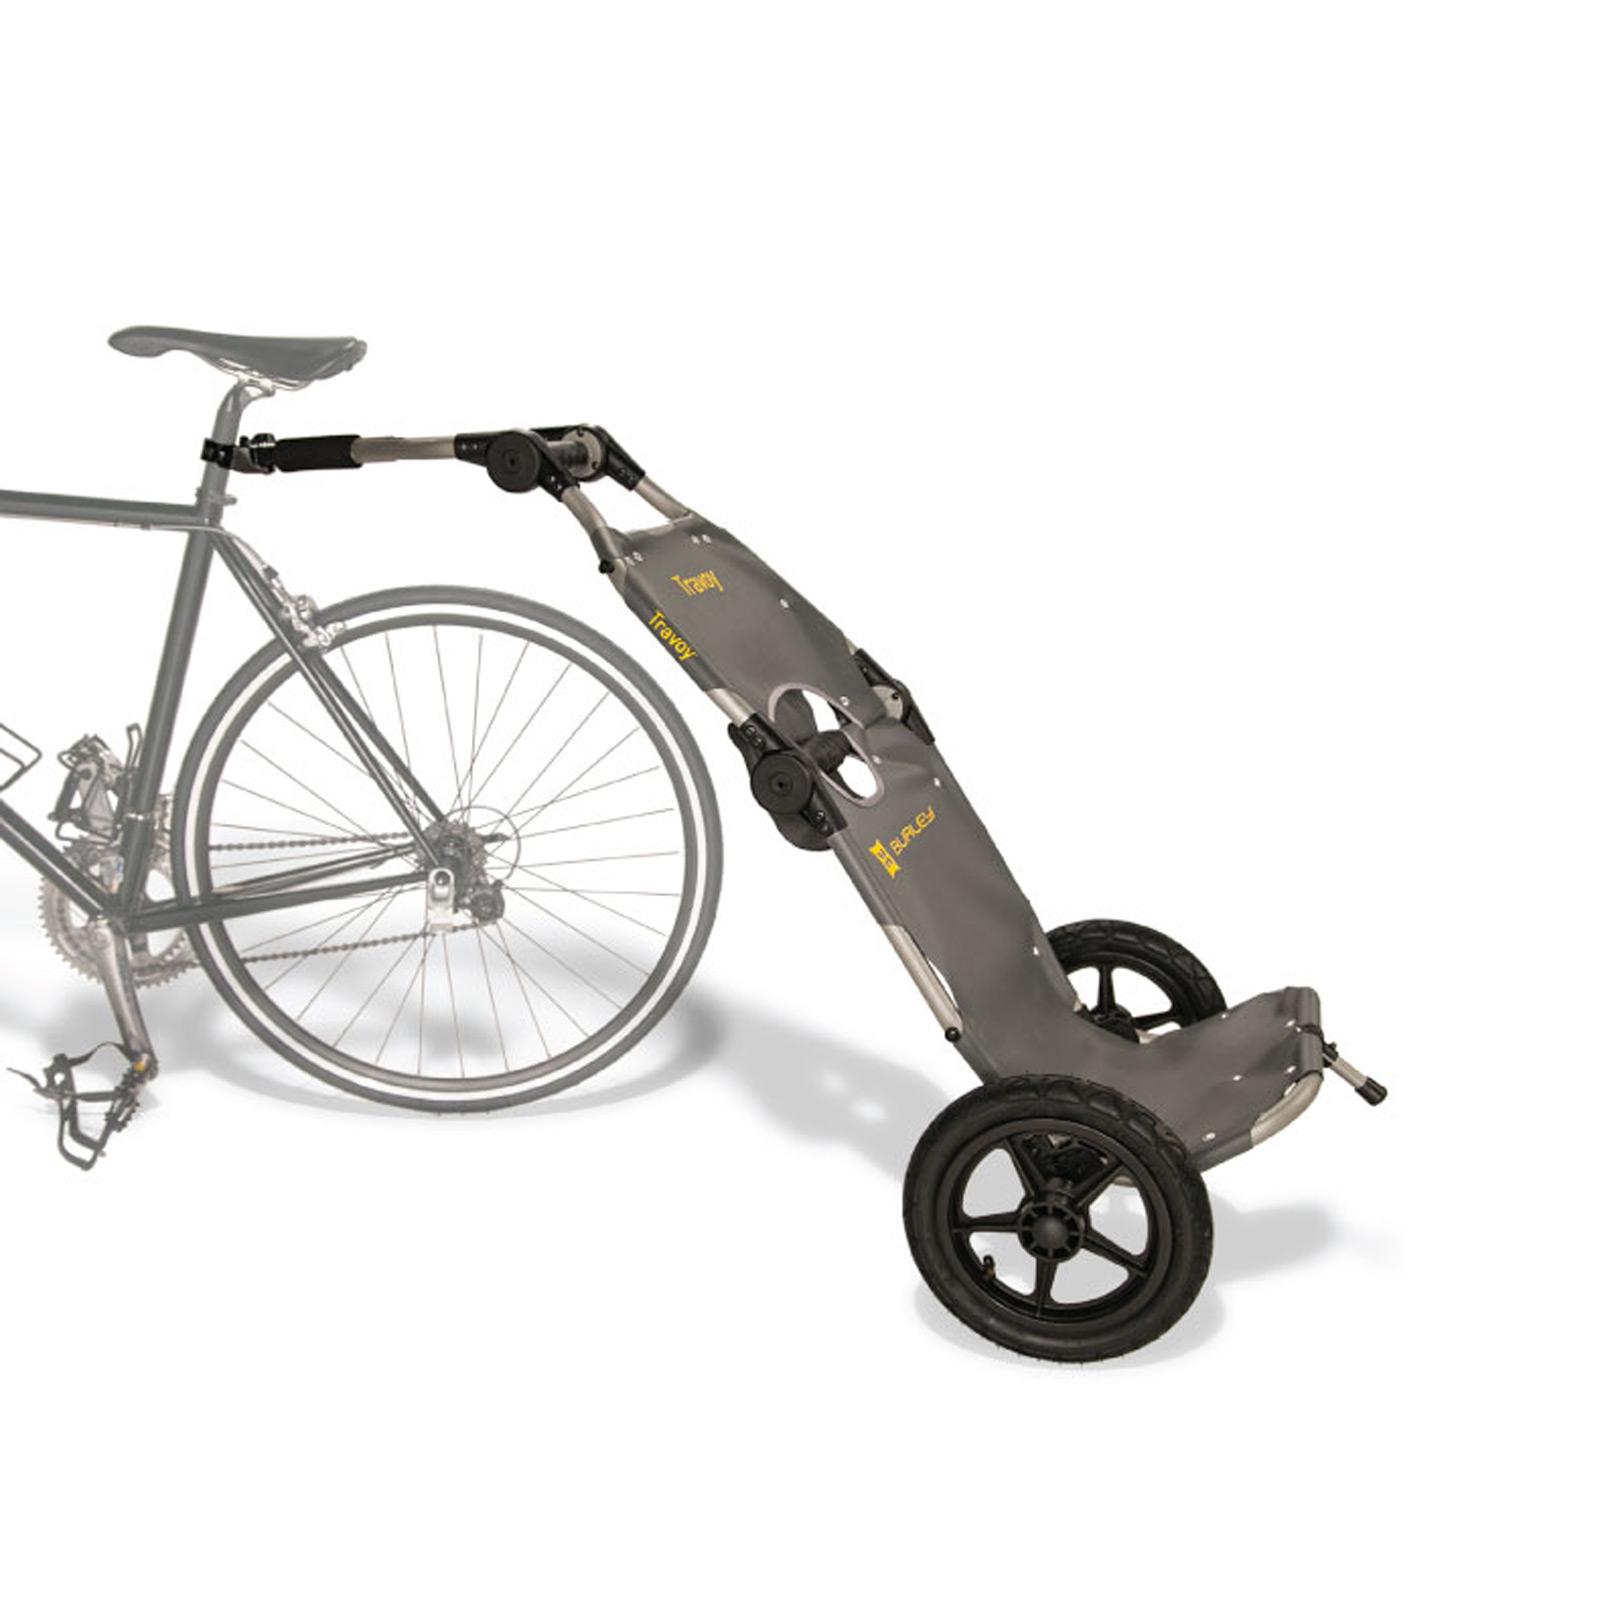 fahrrad lastenanh nger burley travoy einkaufstrolley. Black Bedroom Furniture Sets. Home Design Ideas